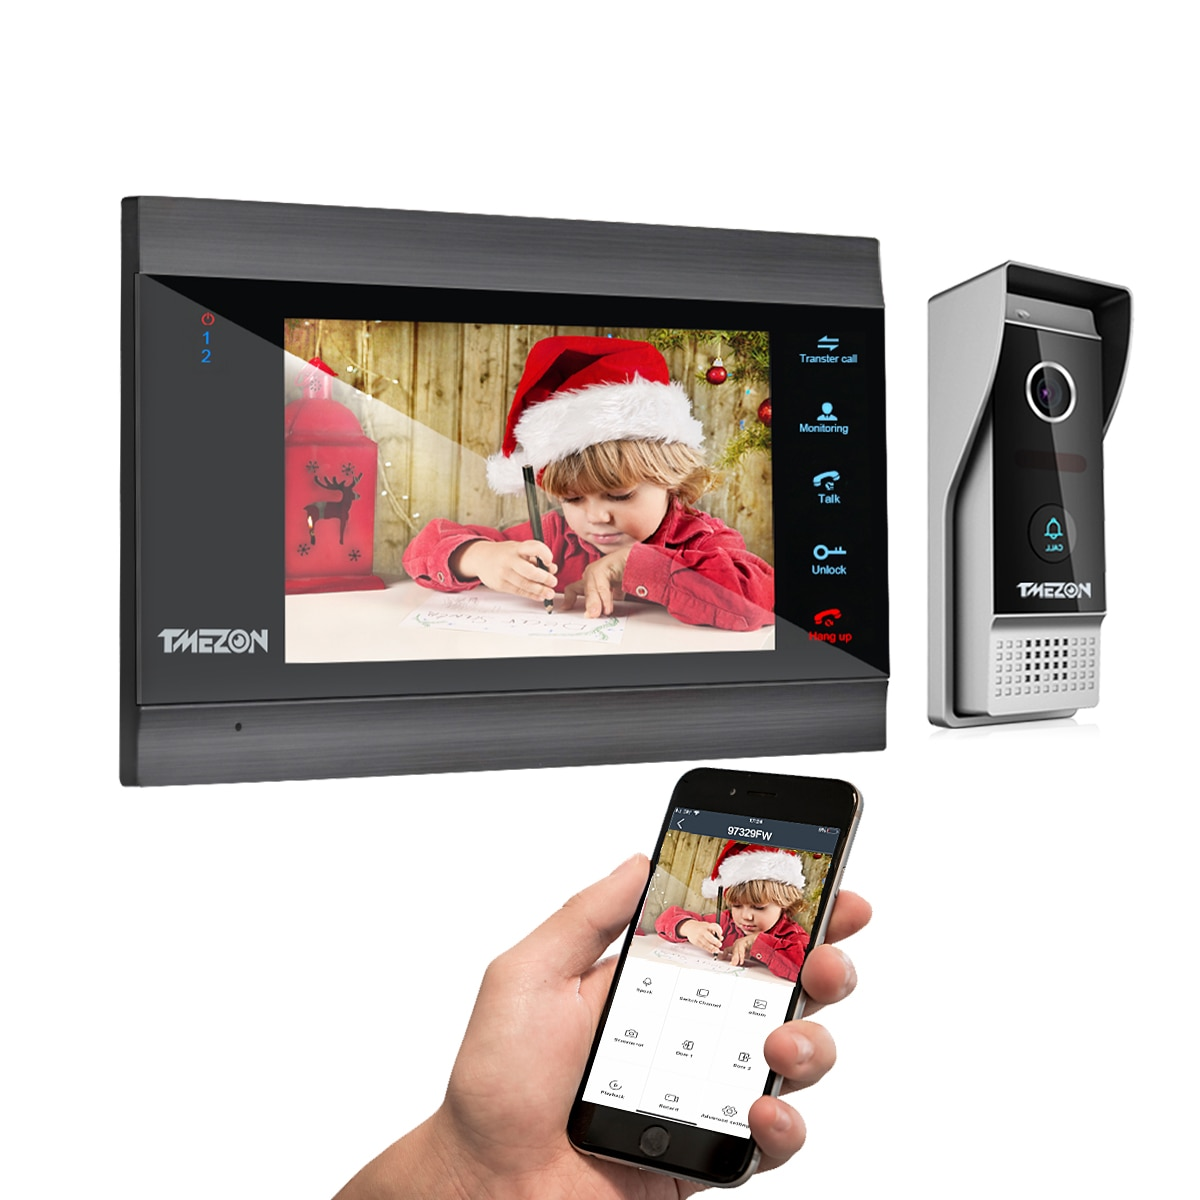 30% Off للاستخدام tmeزون المنزل نظام اتصال داخلي لاسلكي واي فاي الذكية IP جرس باب يتضمن شاشة عرض فيديو 7 بوصة مع 1x1200TVL السلكية باب الهاتف كاميرا